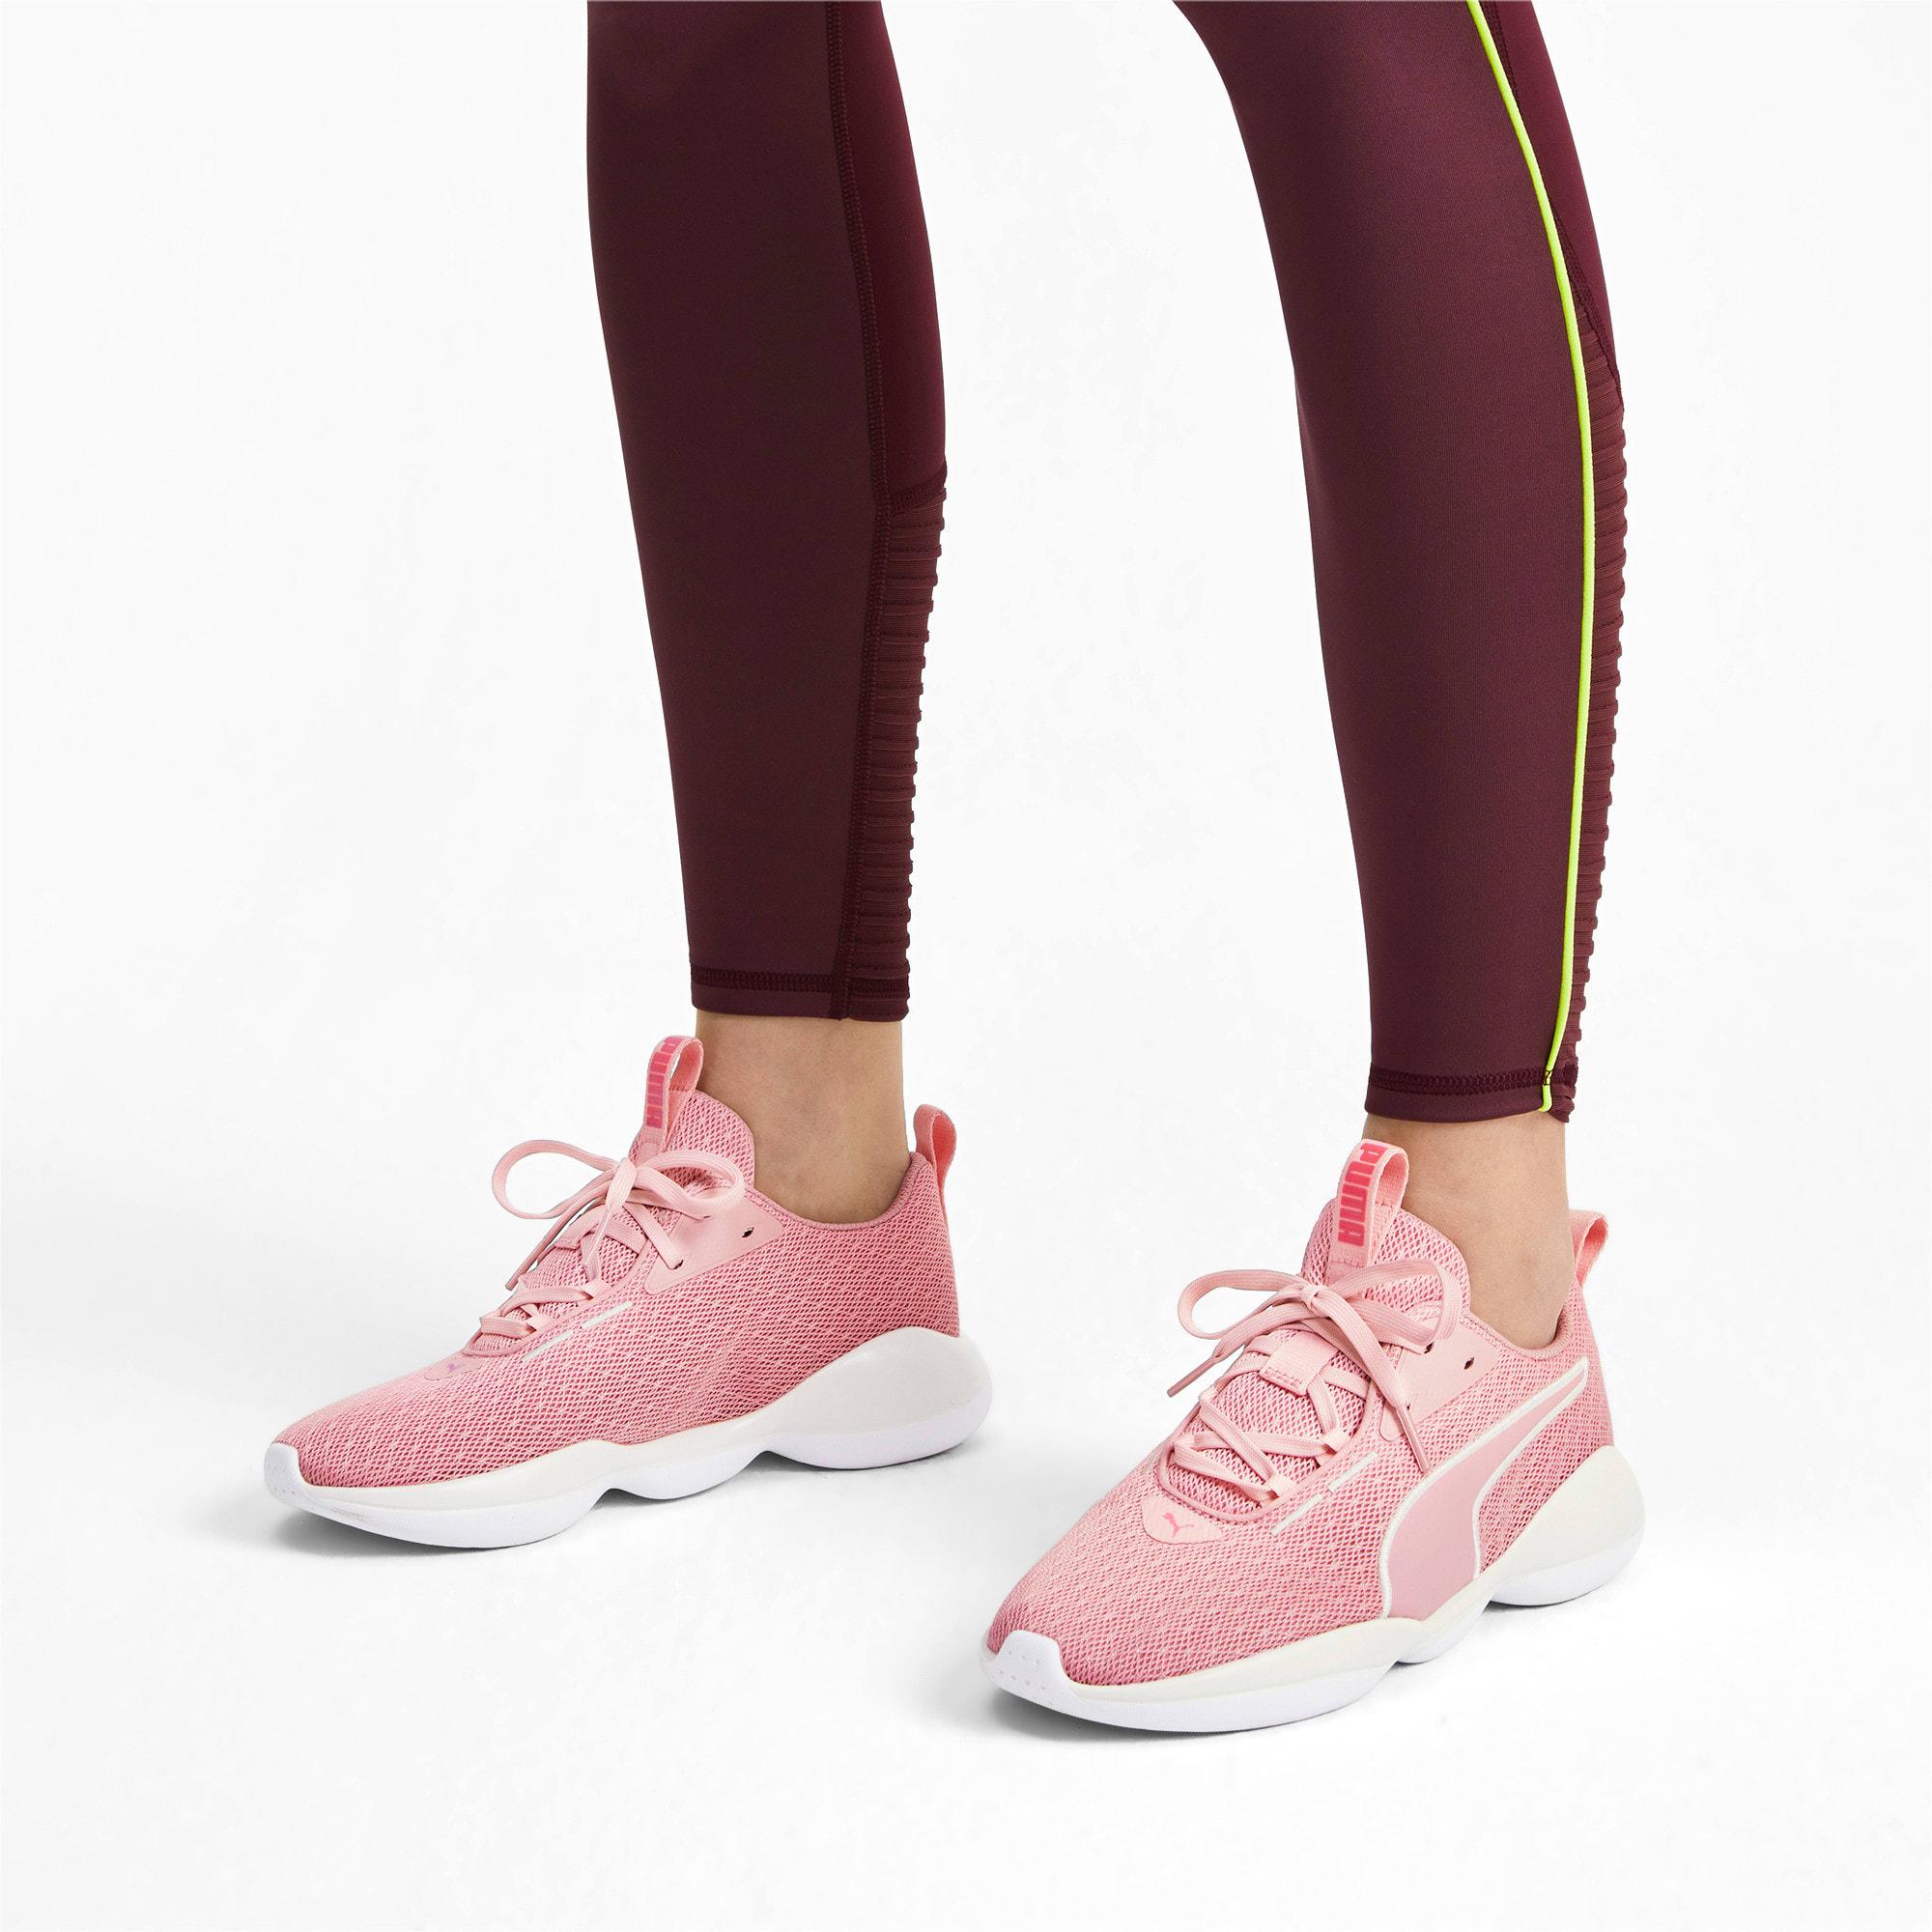 Thumbnail 2 of Flourish FS Women's Running Shoes, Bridal Rose-Puma White, medium-IND